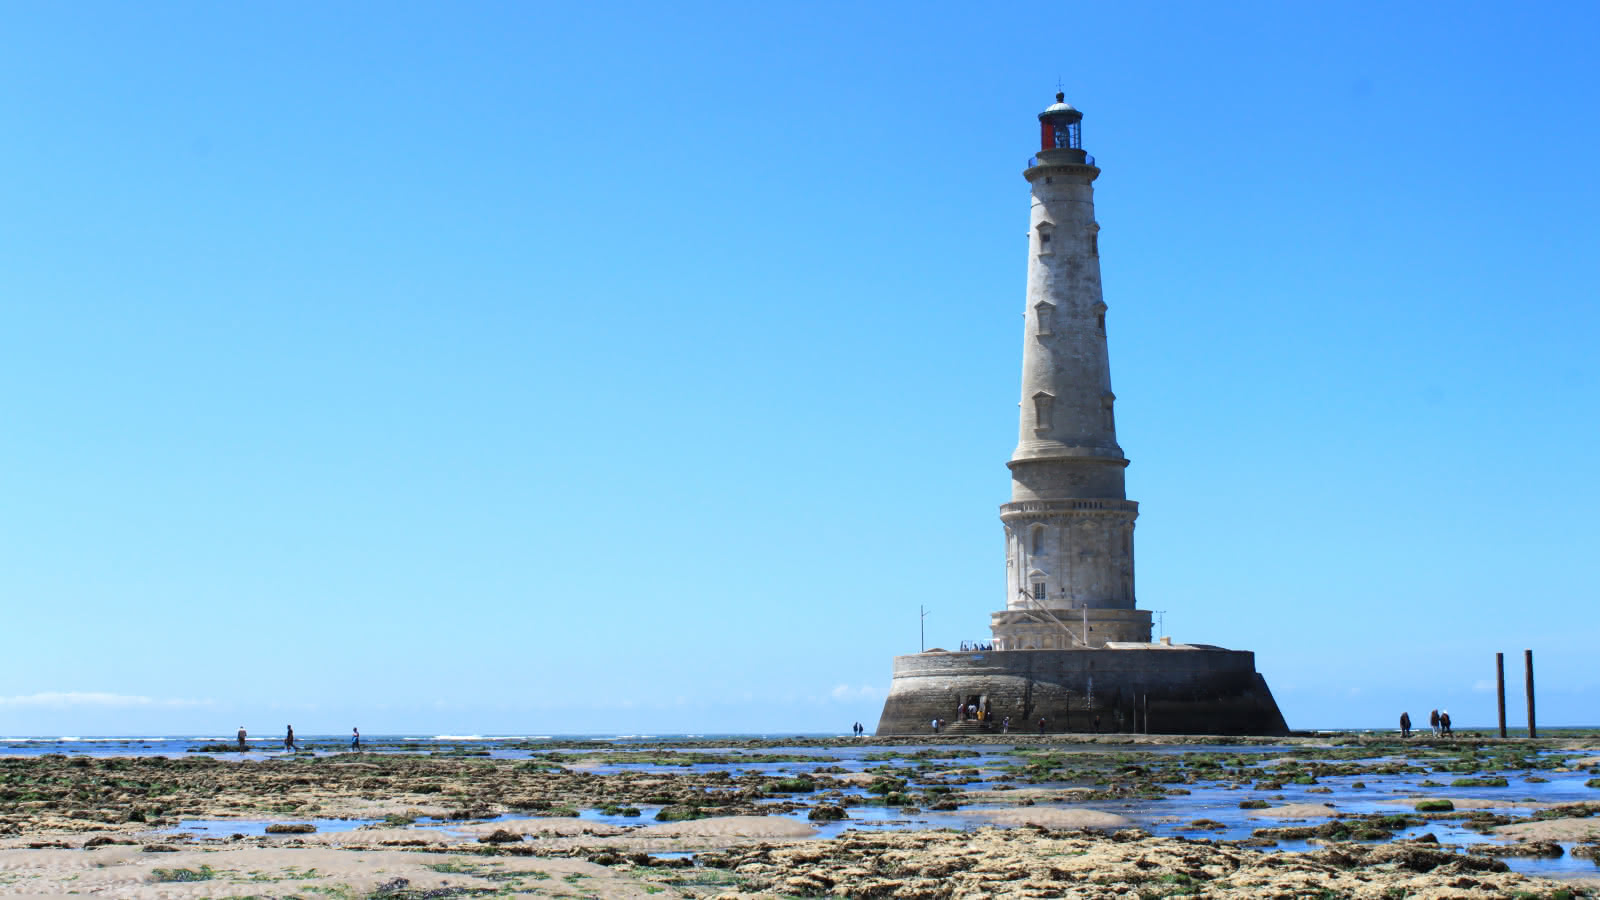 phare-de-cordouan-medoc-atlantique-17